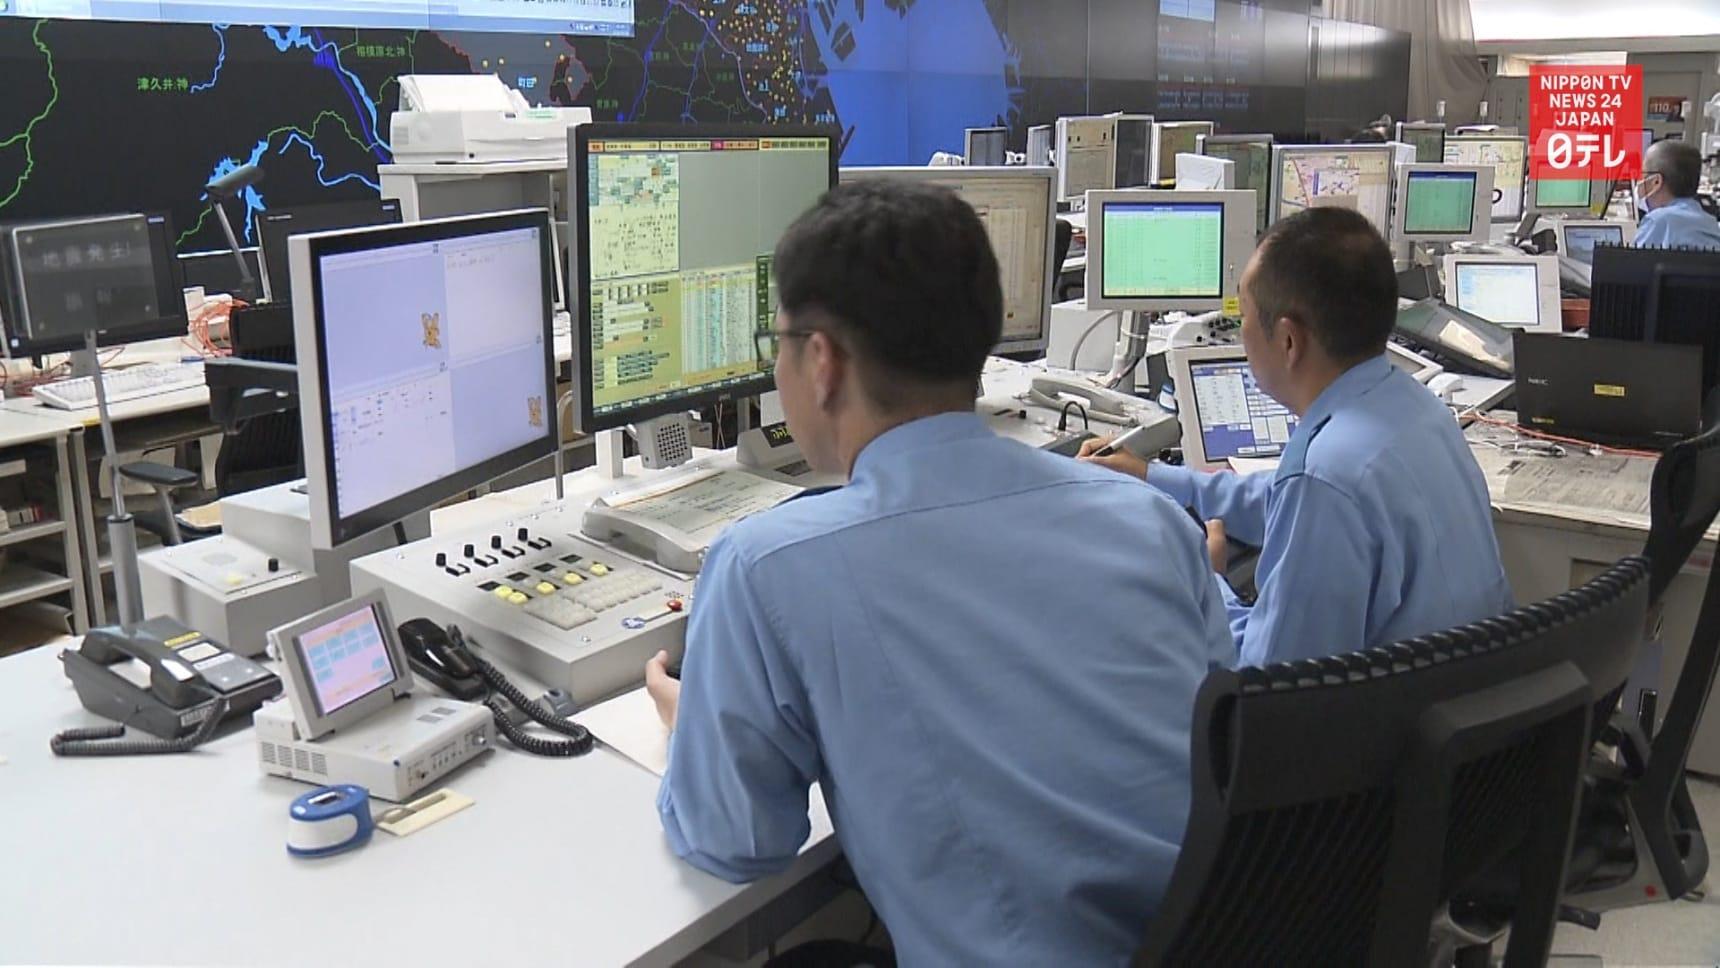 Emergency Calls Spike in Tokyo